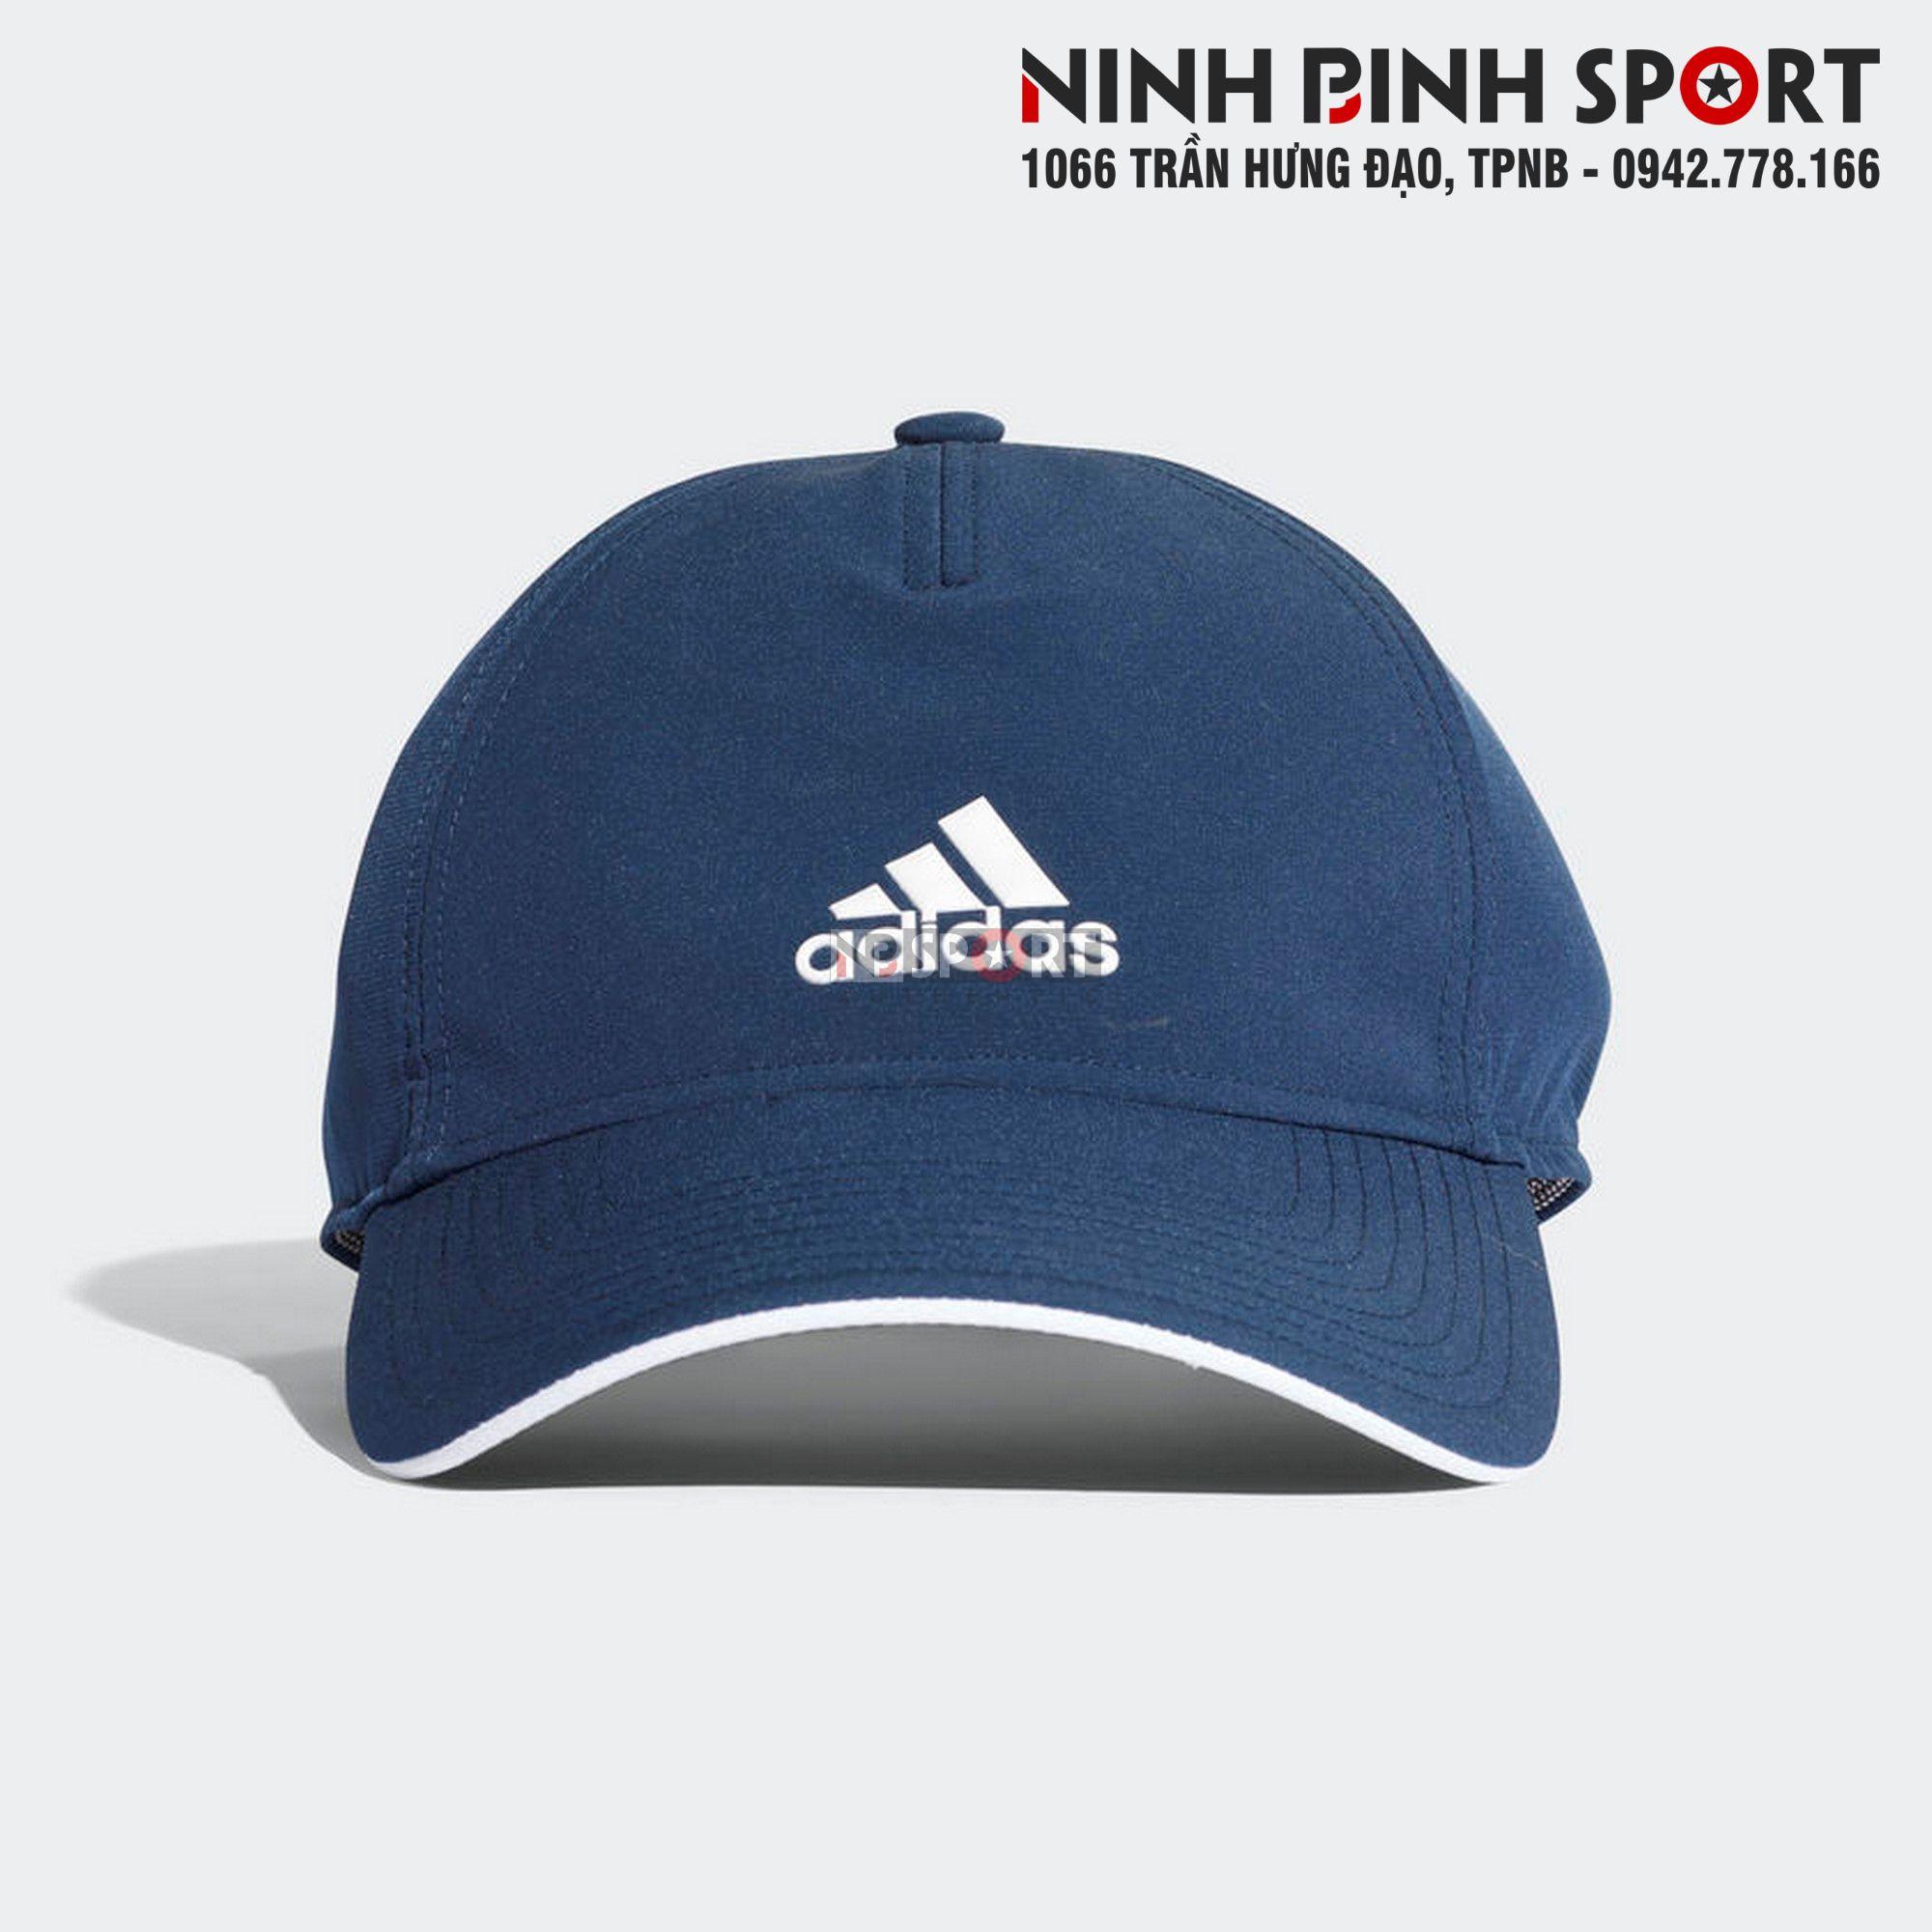 Mũ thể thao Adidas C40 Climalite Blue CG2314